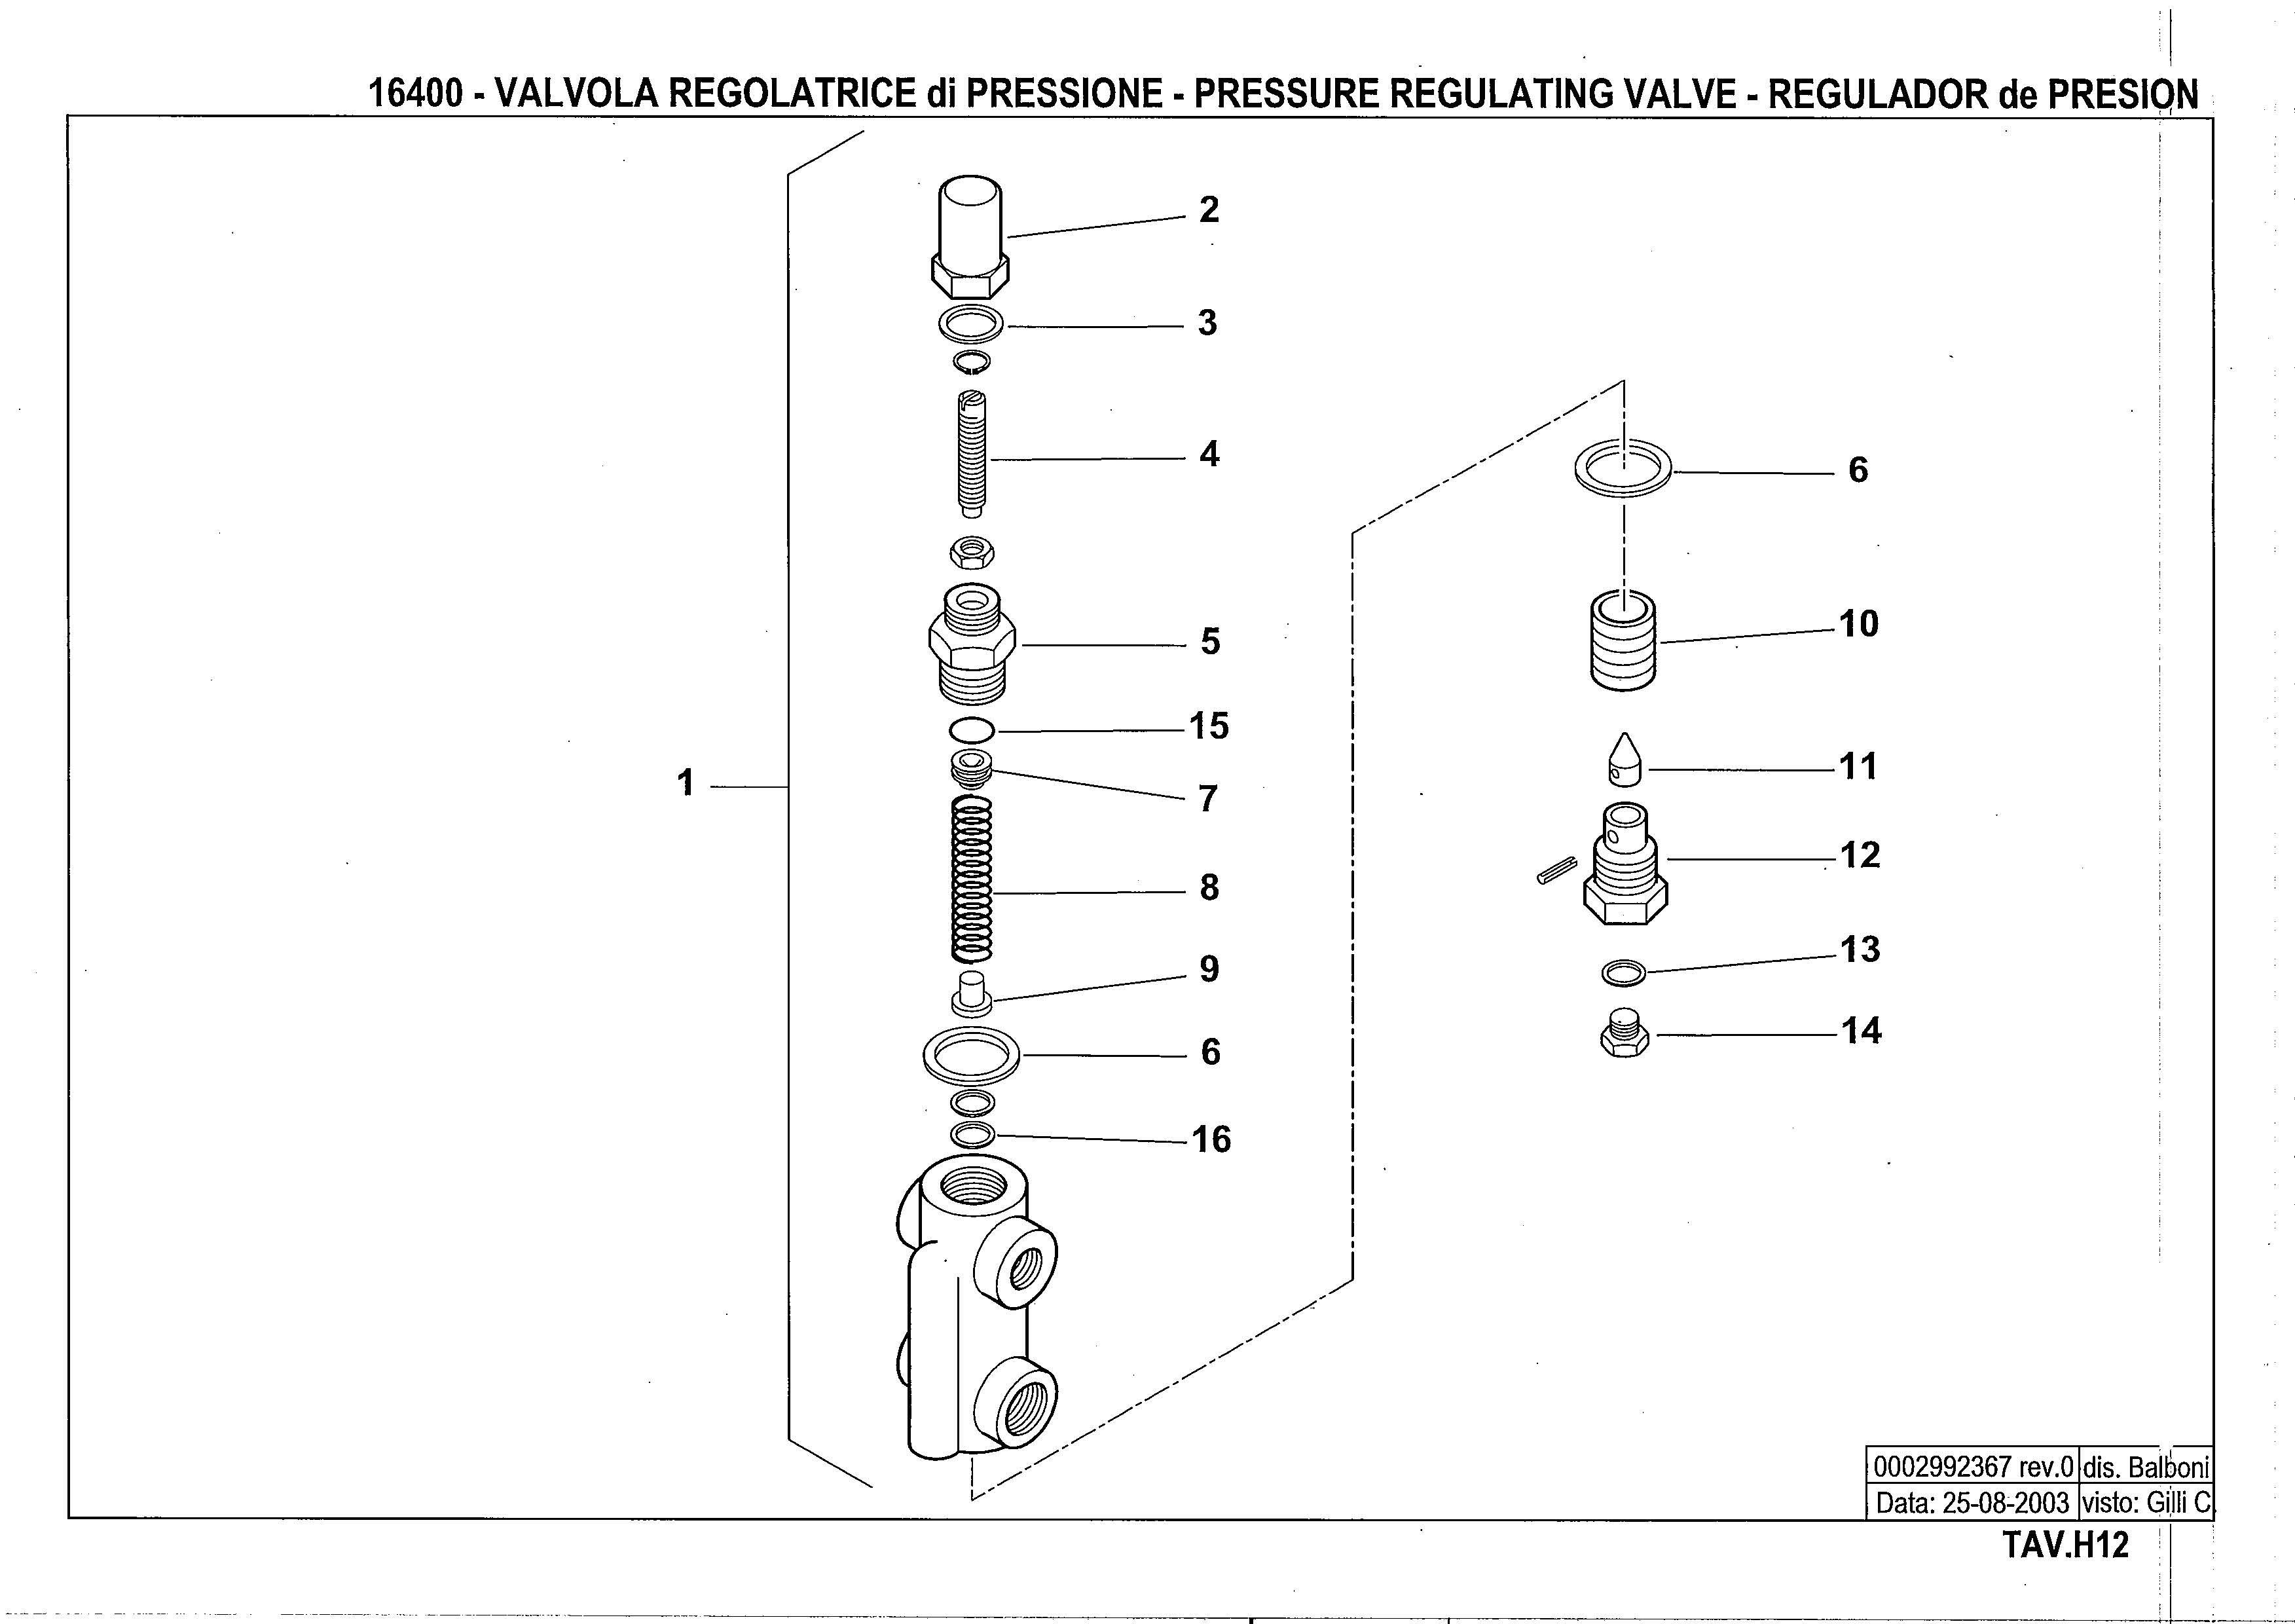 Регулятор давления жидкого топлива H12 16400 0 20030825